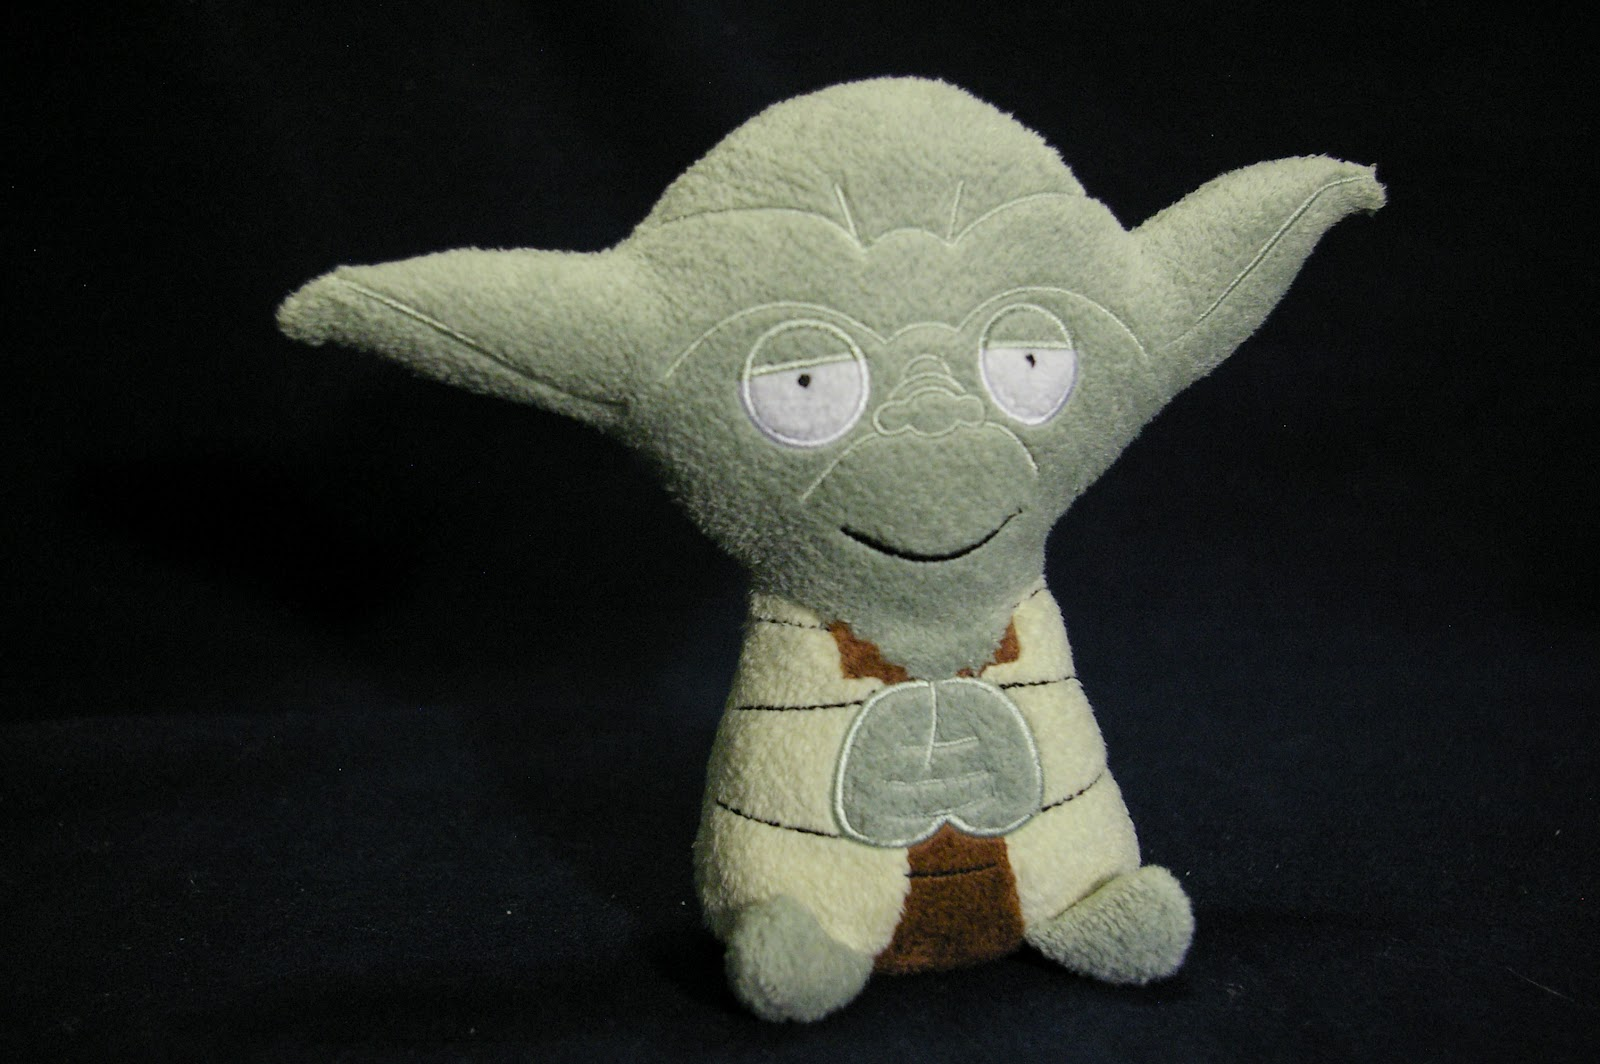 star wars esb yoda using force prestige format resin